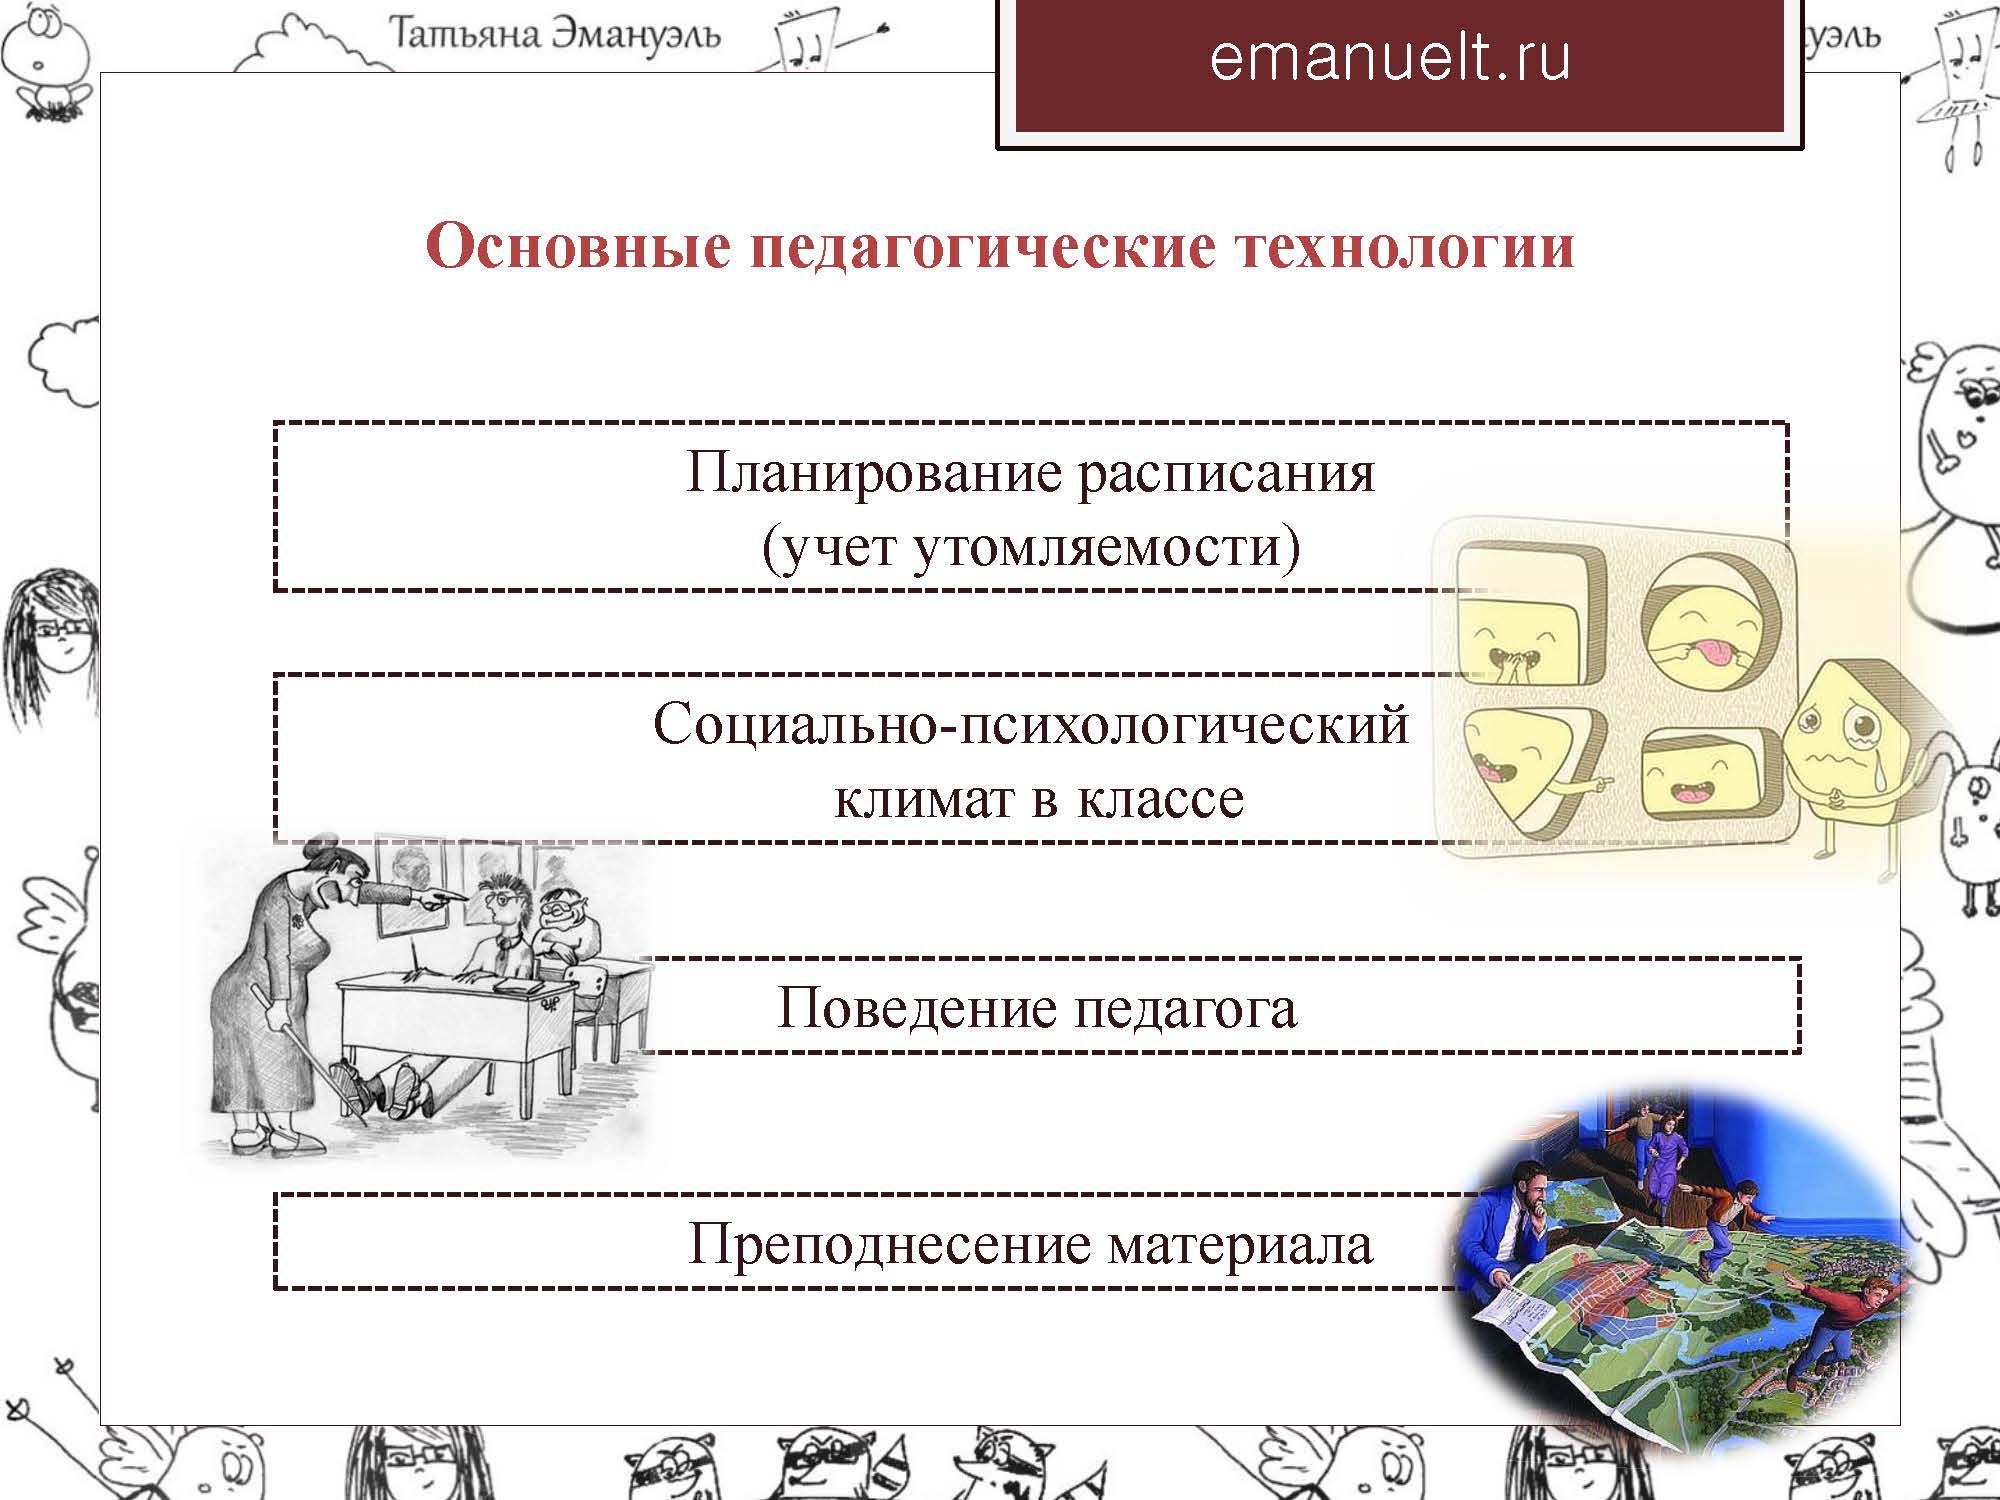 06 февраля эмануэль_Страница_079